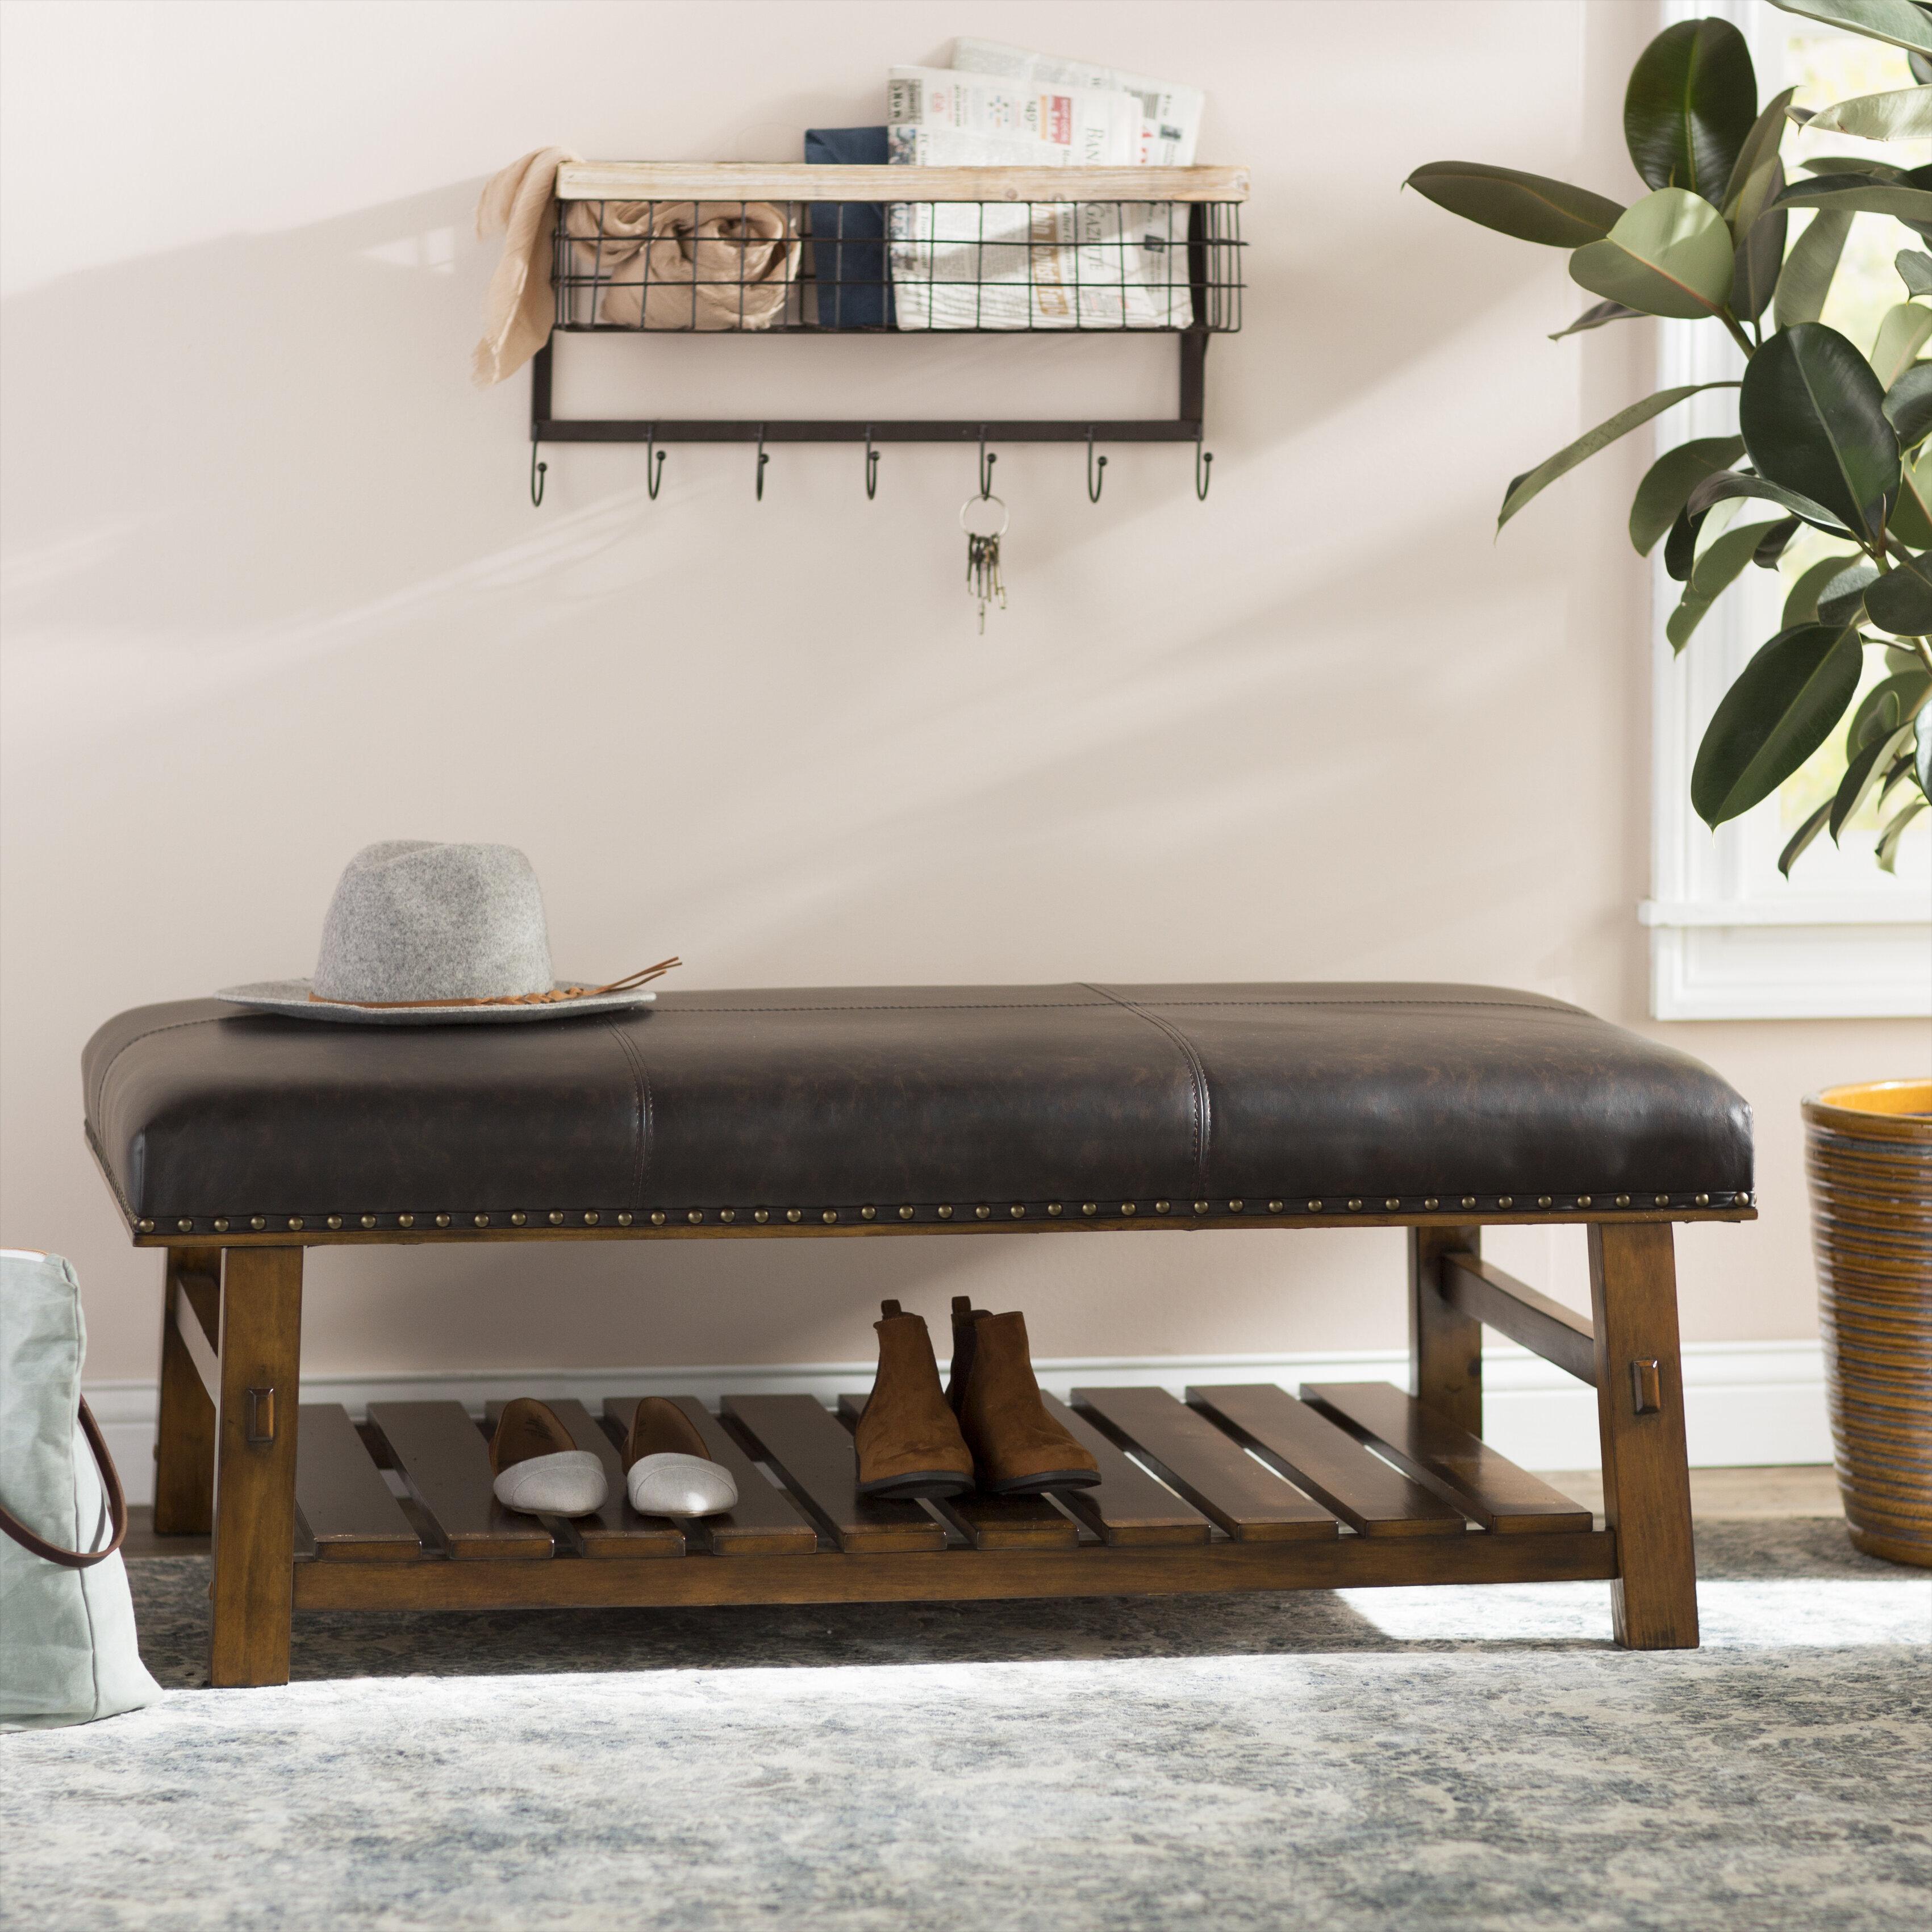 Etonnant Millwood Pines Tabron Fabric Upholstered Storage Bench U0026 Reviews | Wayfair